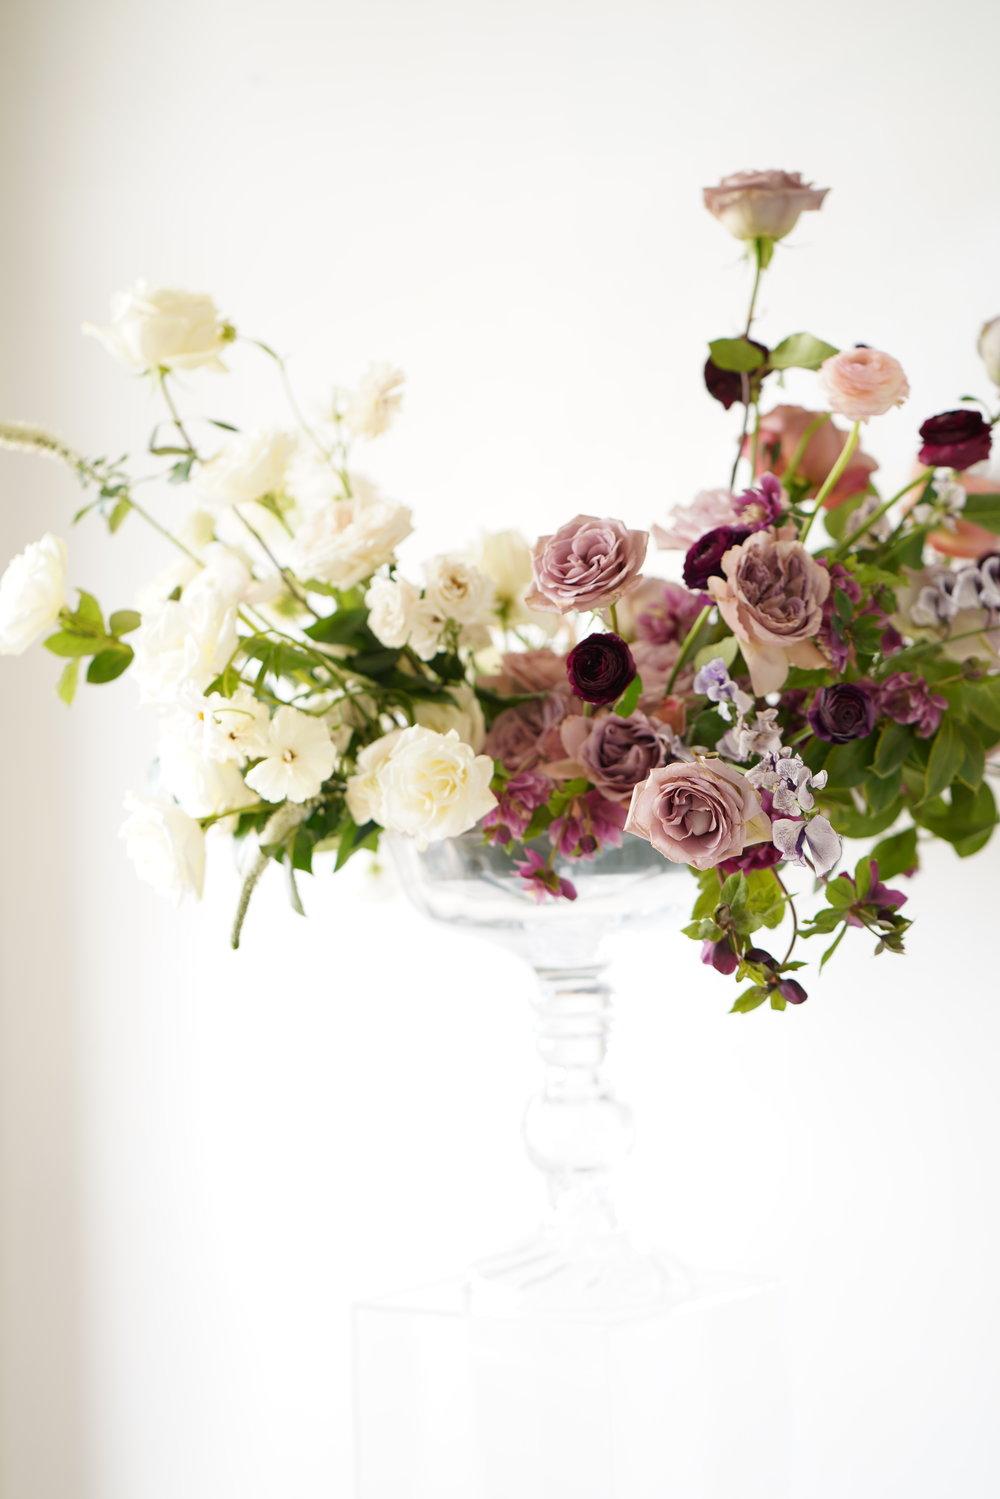 Garden style, tall arrangement created for a centerpiece at a wedding. Maxit Flower Design